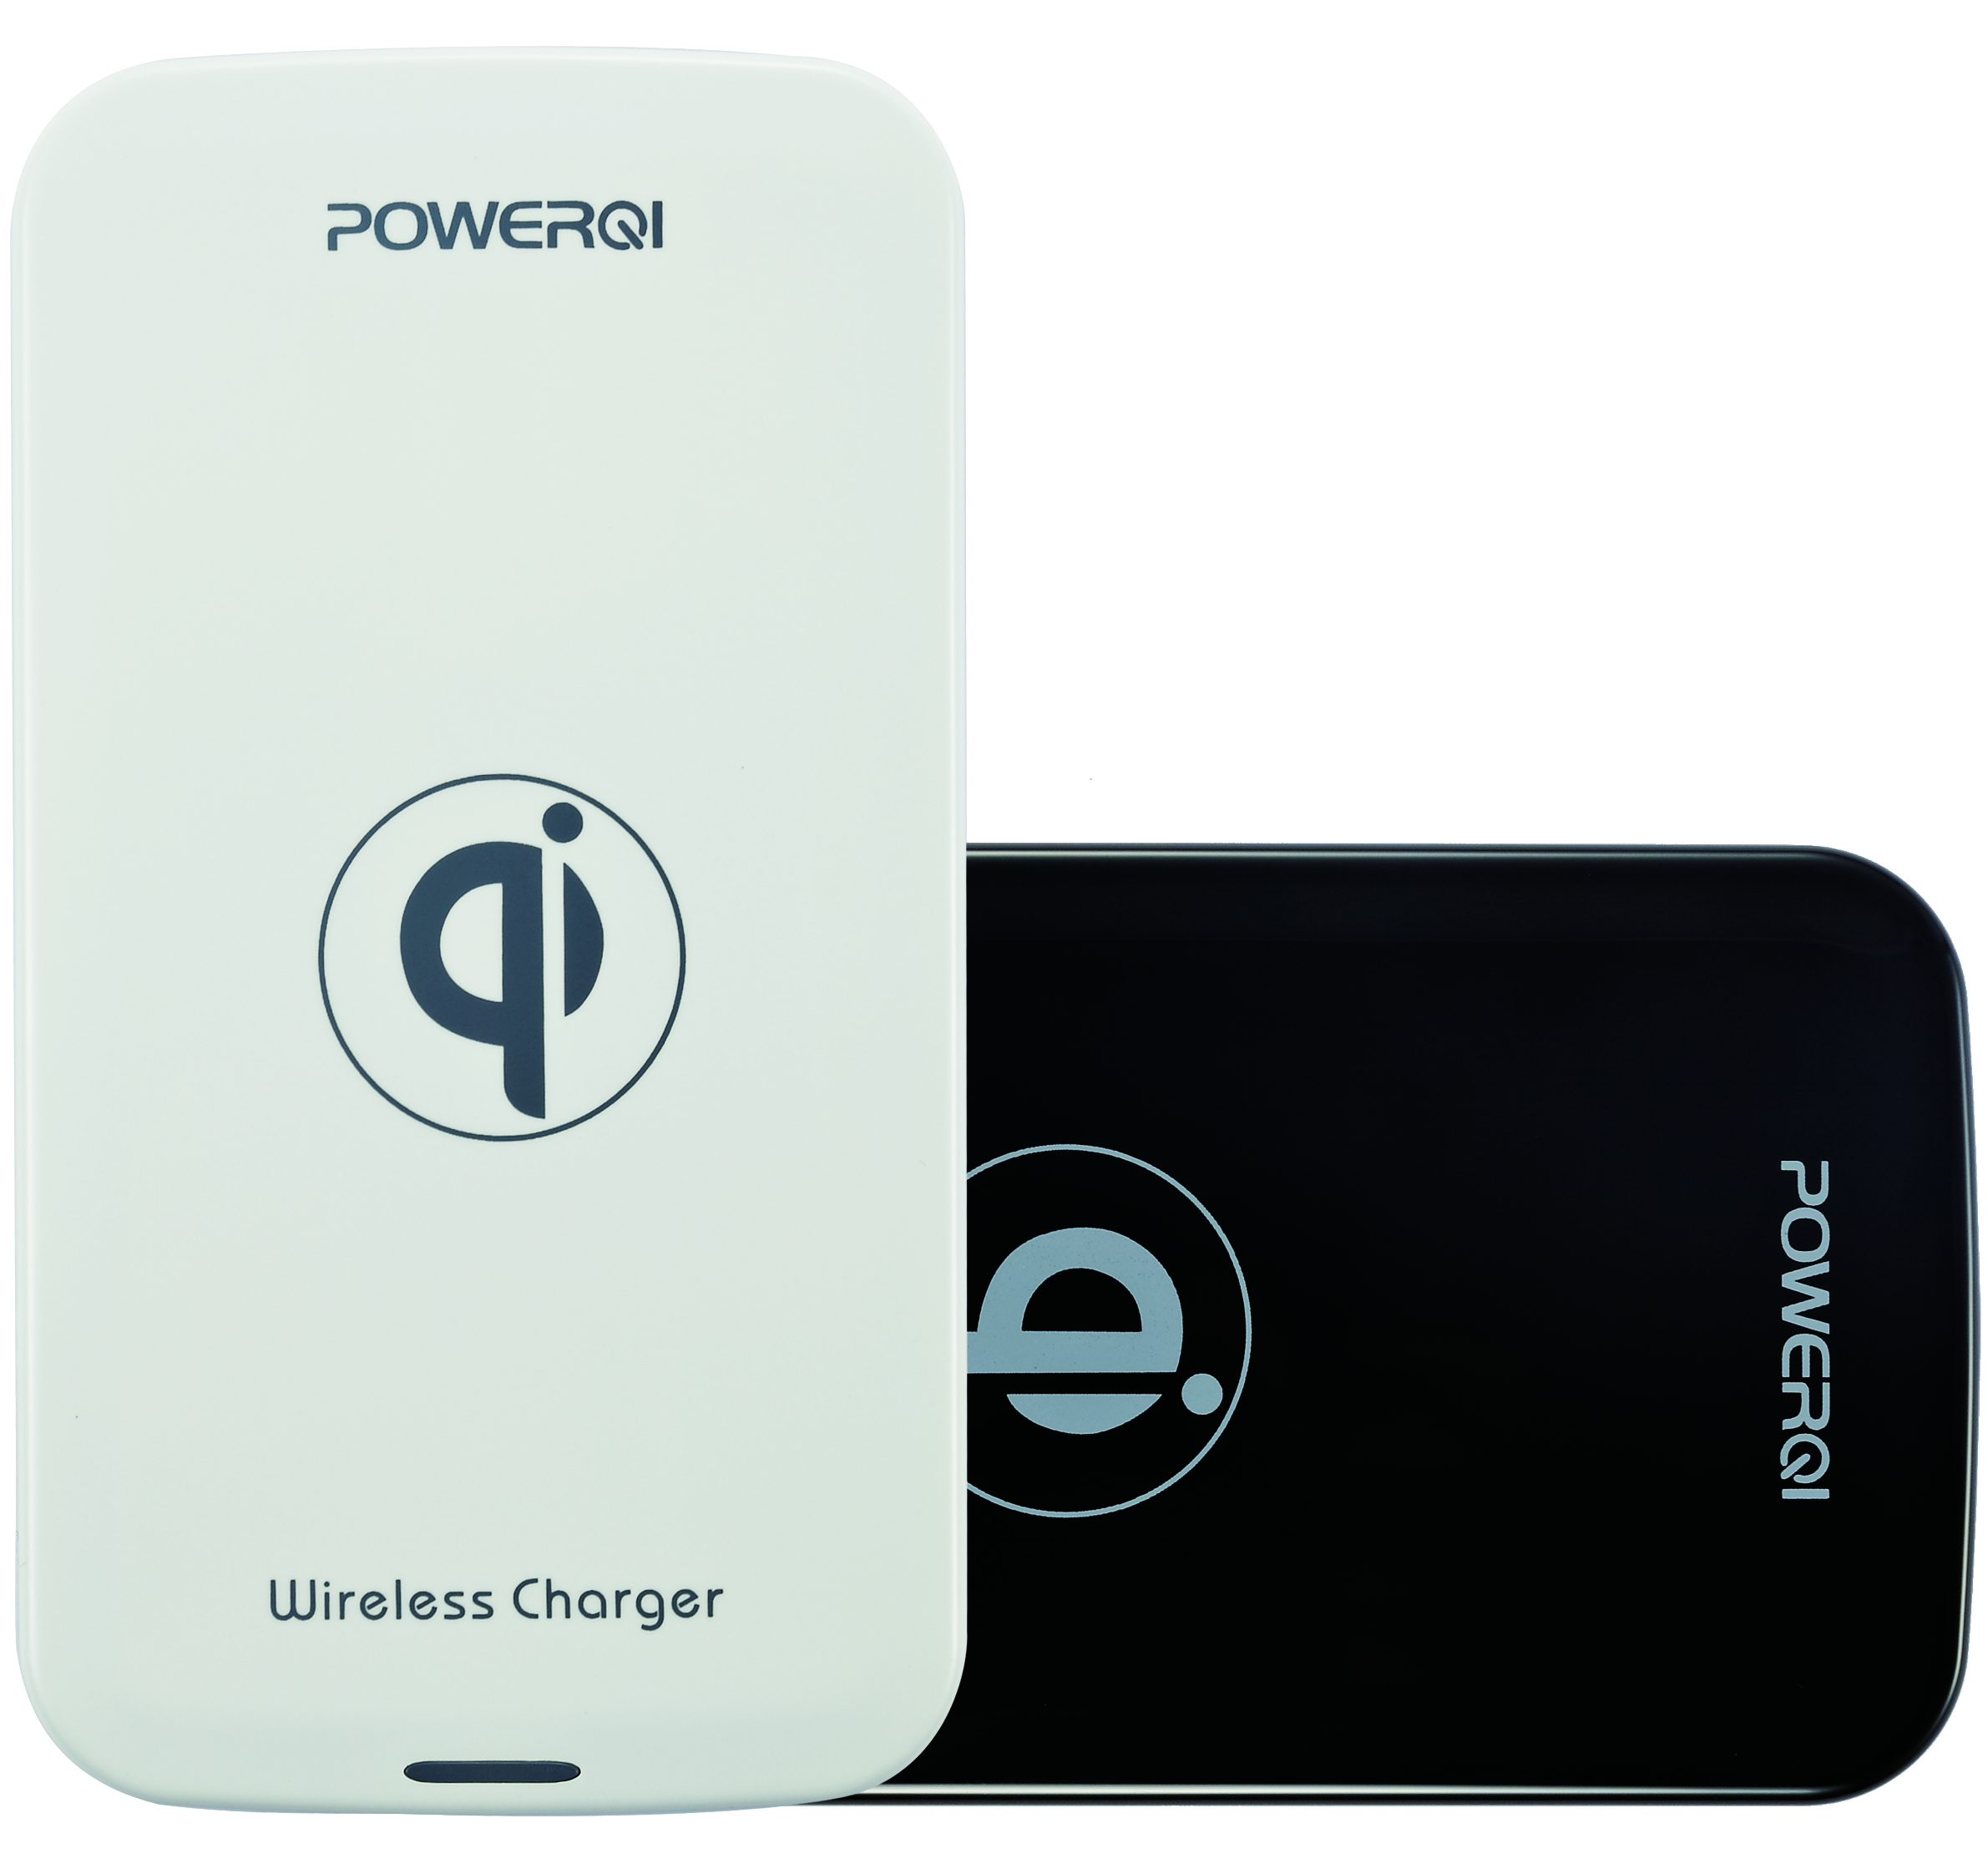 GOQI wireless charging wallets